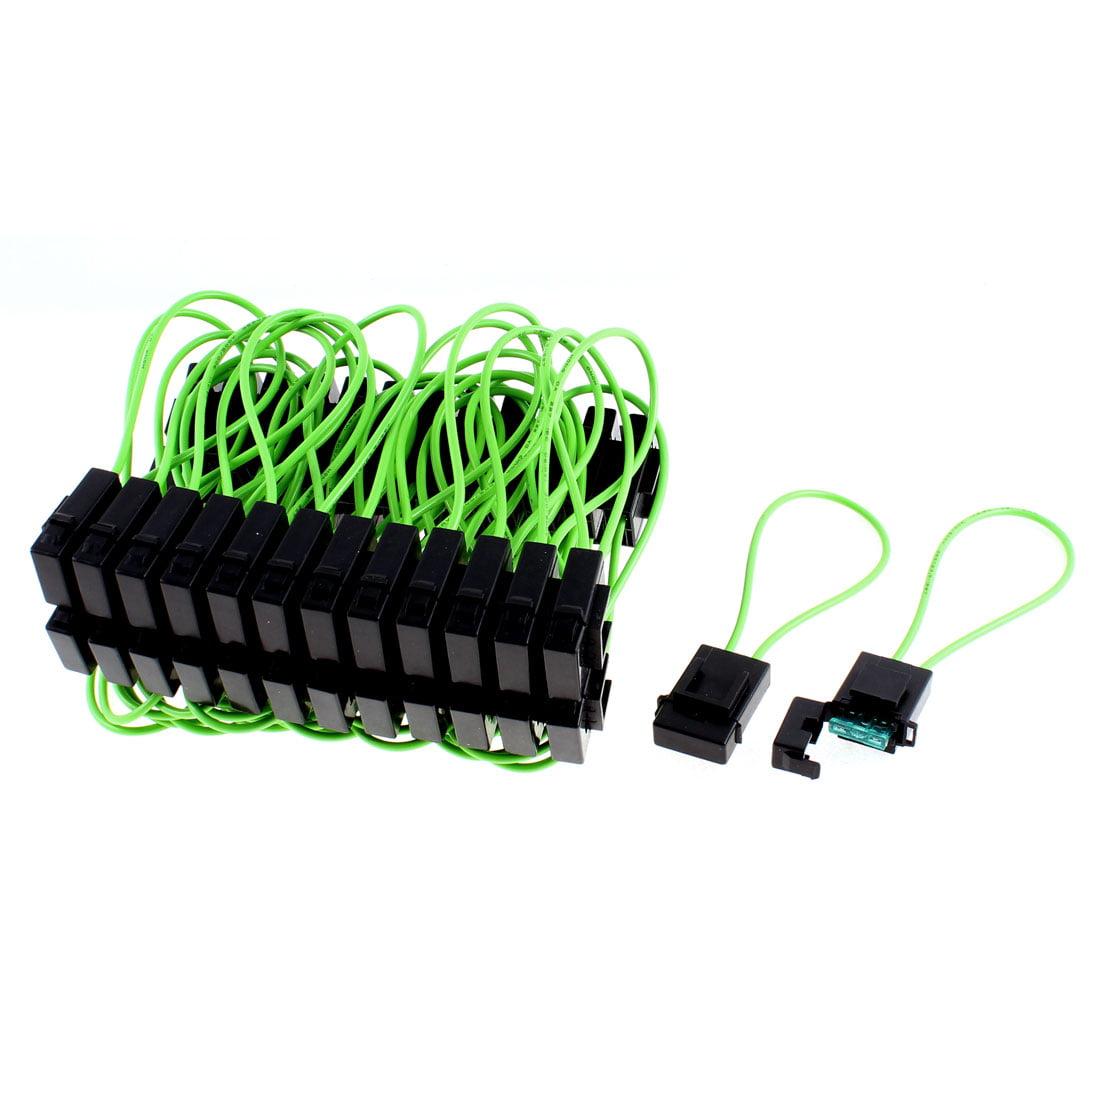 Unique Bargains 50 x Black Green Car Sound Audio Inline  Fuse Holder Block 30A - image 3 of 3